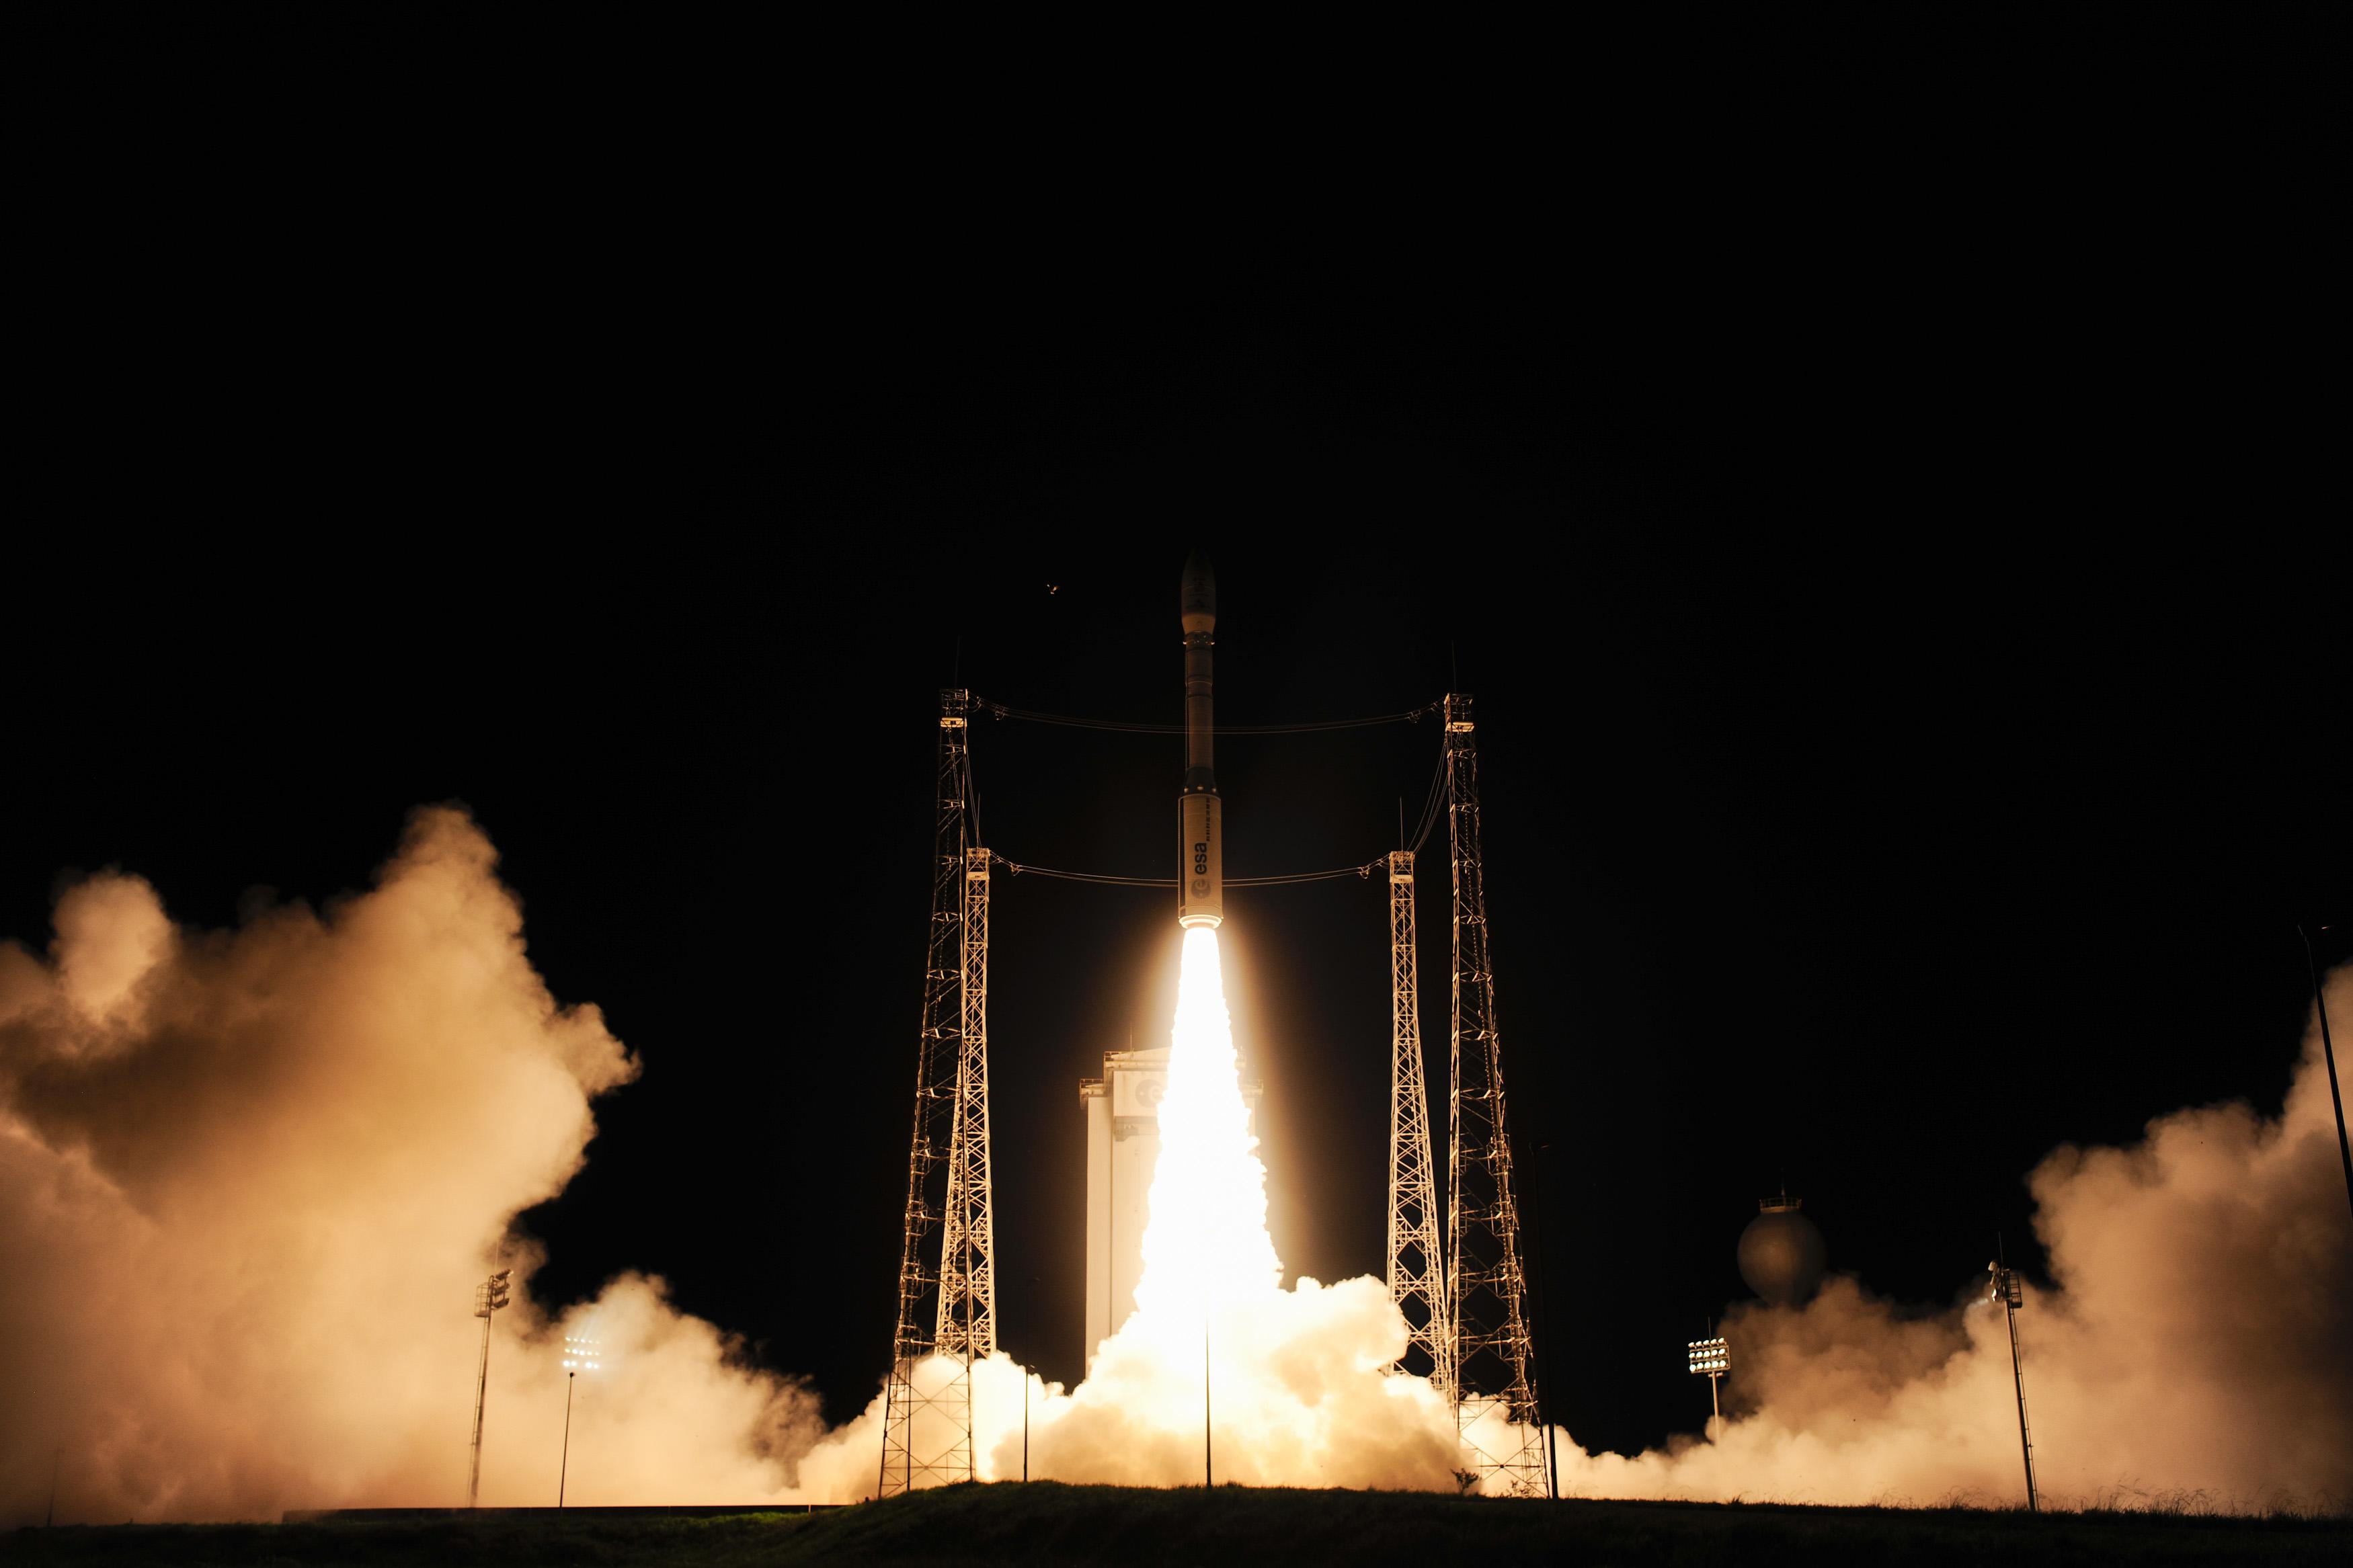 1567215576041-Liftoff_of_Vega_VV06_carrying_LISA_Pathfinder_5.jpg